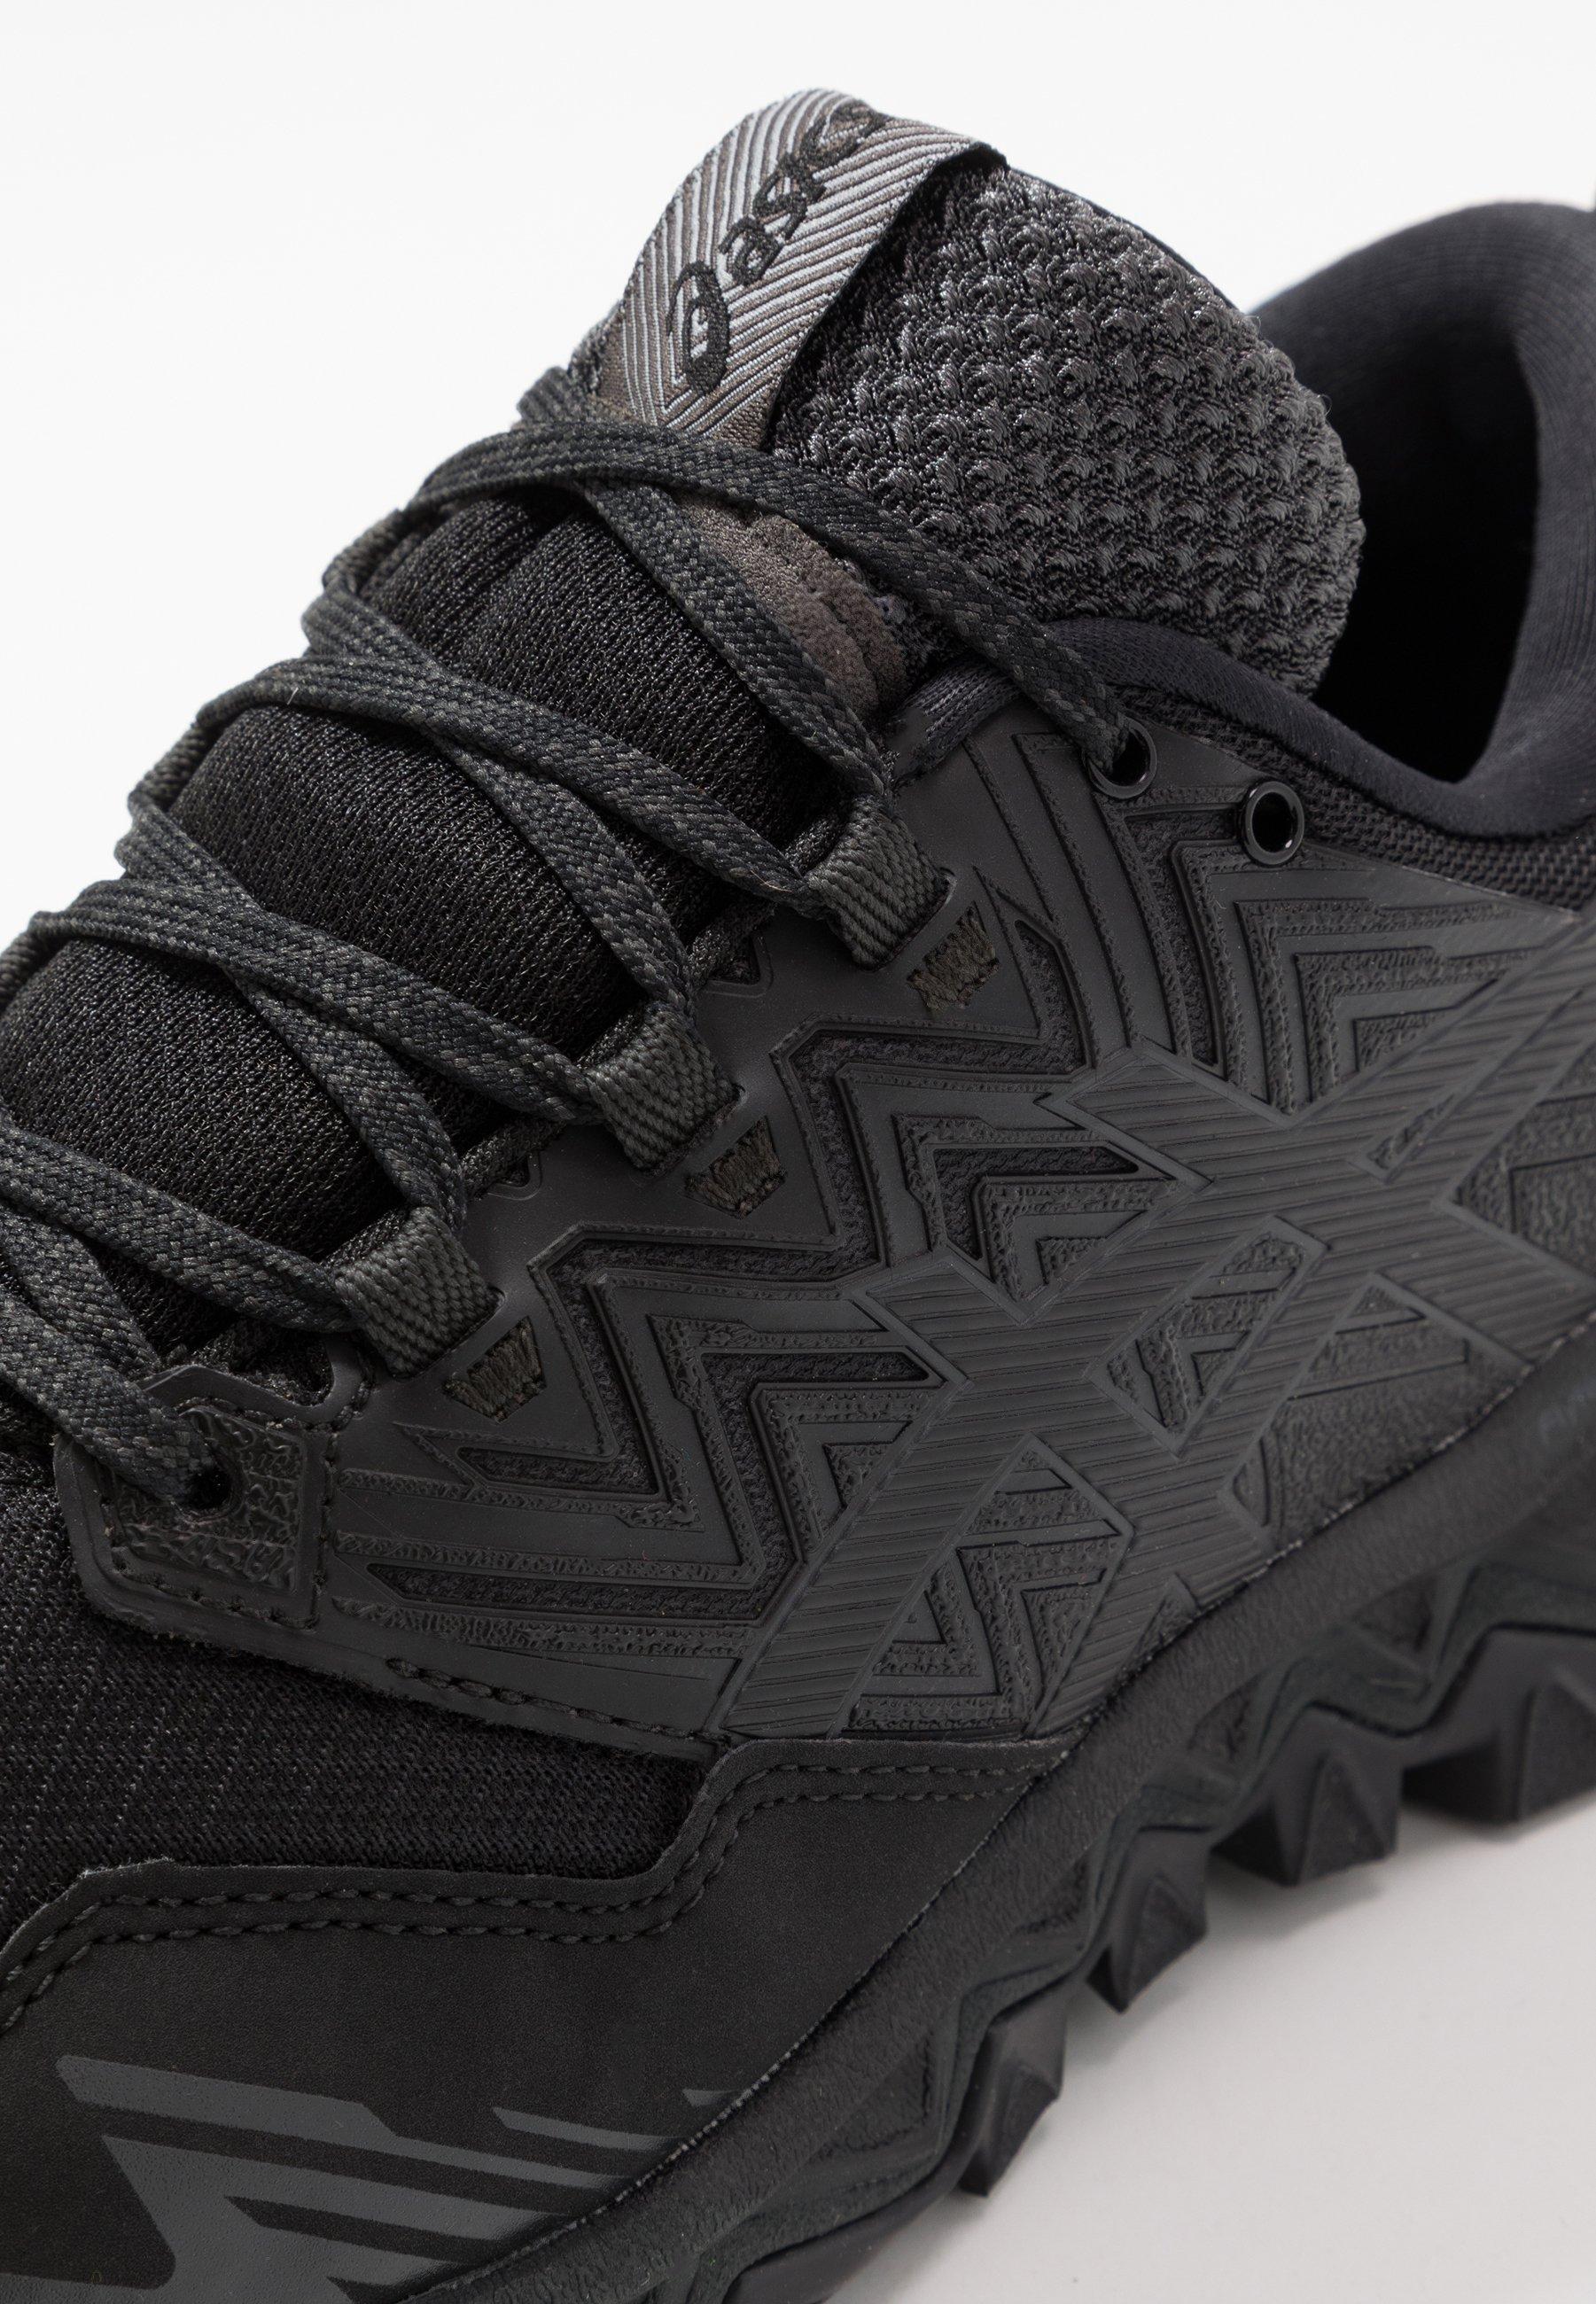 GEL FUJITRABUCO 8 G TX Trail hardloopschoenen black